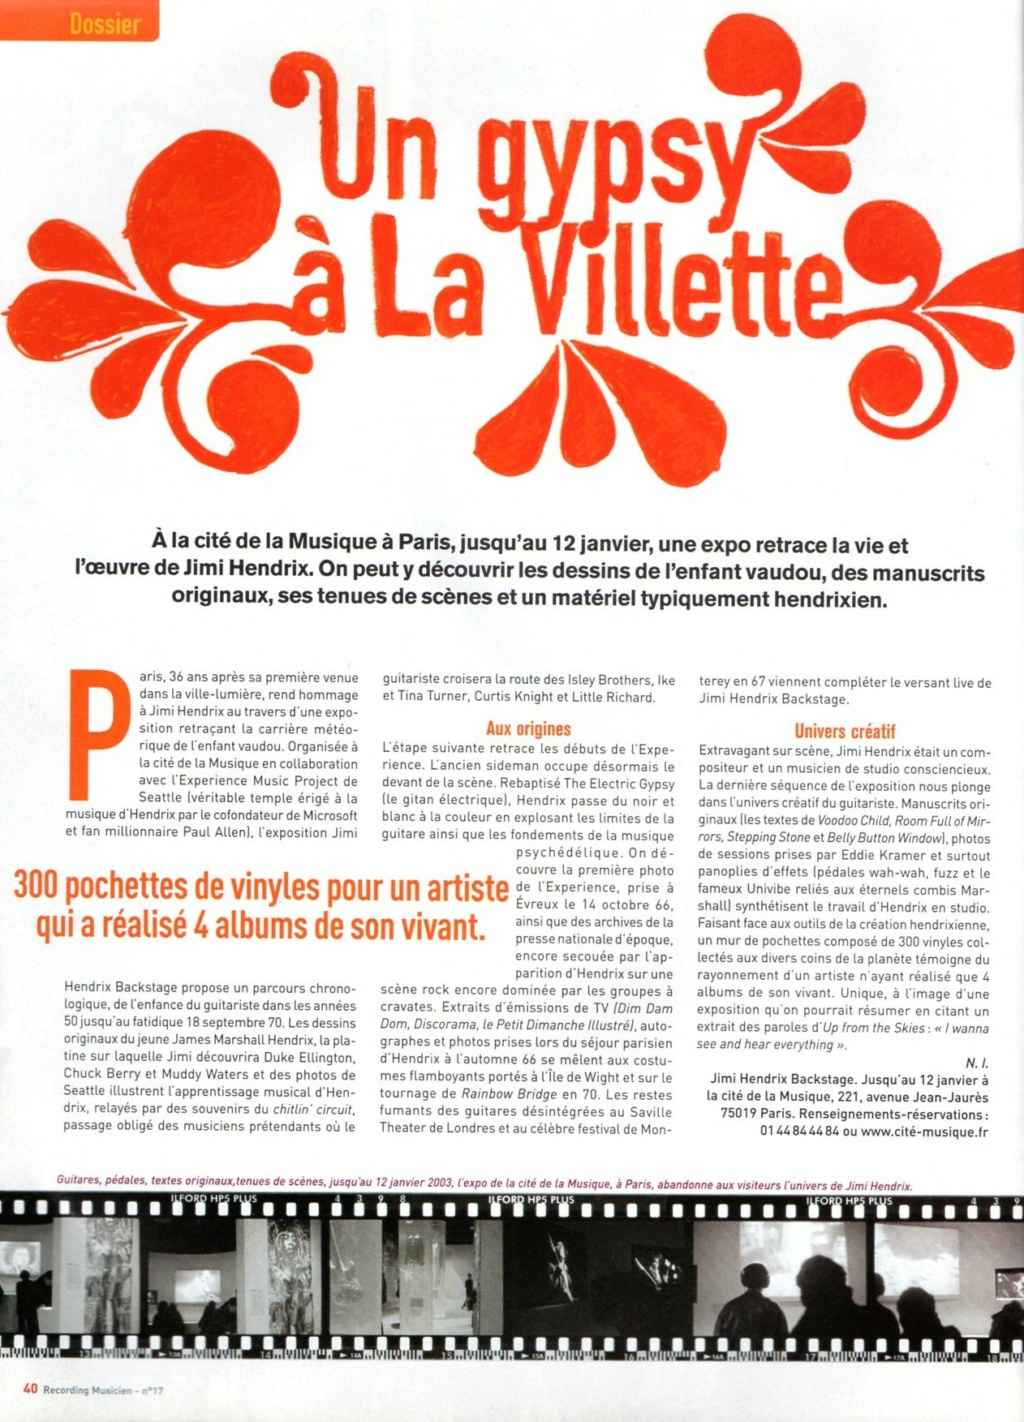 Magazines Français 1989 - 2014 - Page 2 Record19